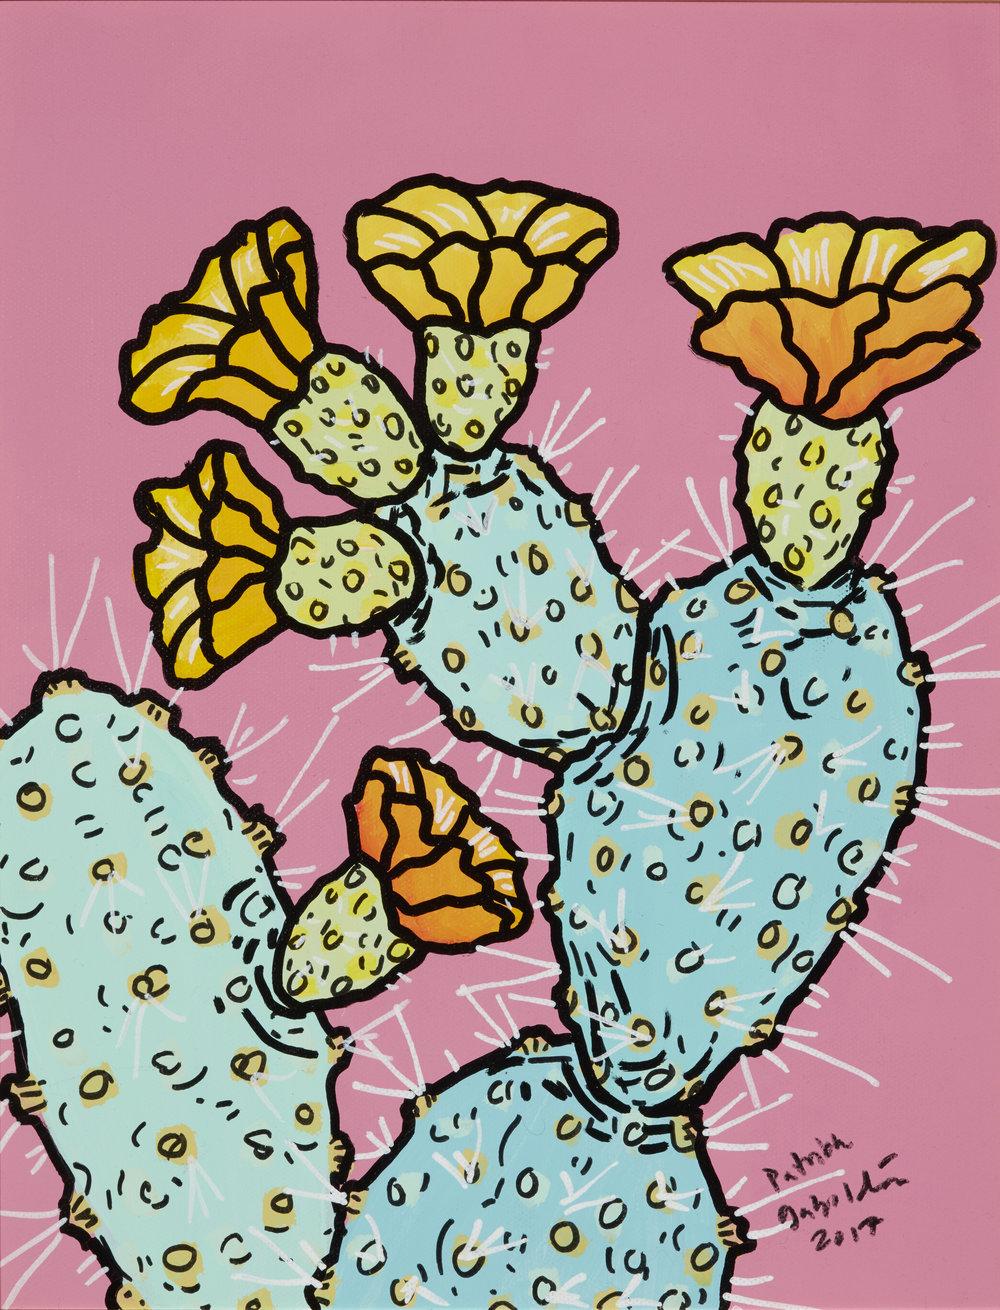 Prickly_5.jpg